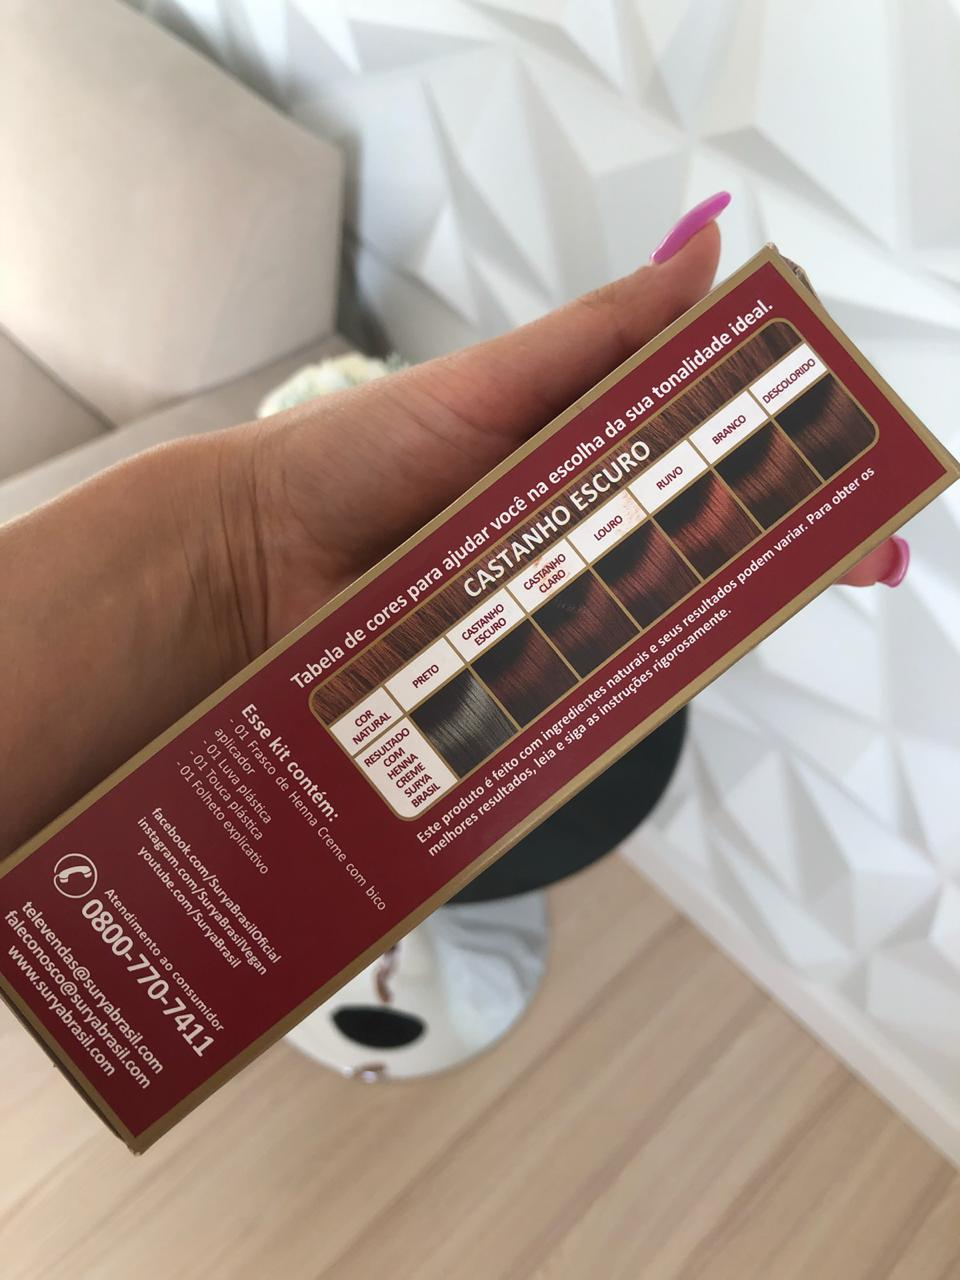 Tintura Natural para Cabelo - Henna Creme Castanho Escuro 70ml - Surya Brasil